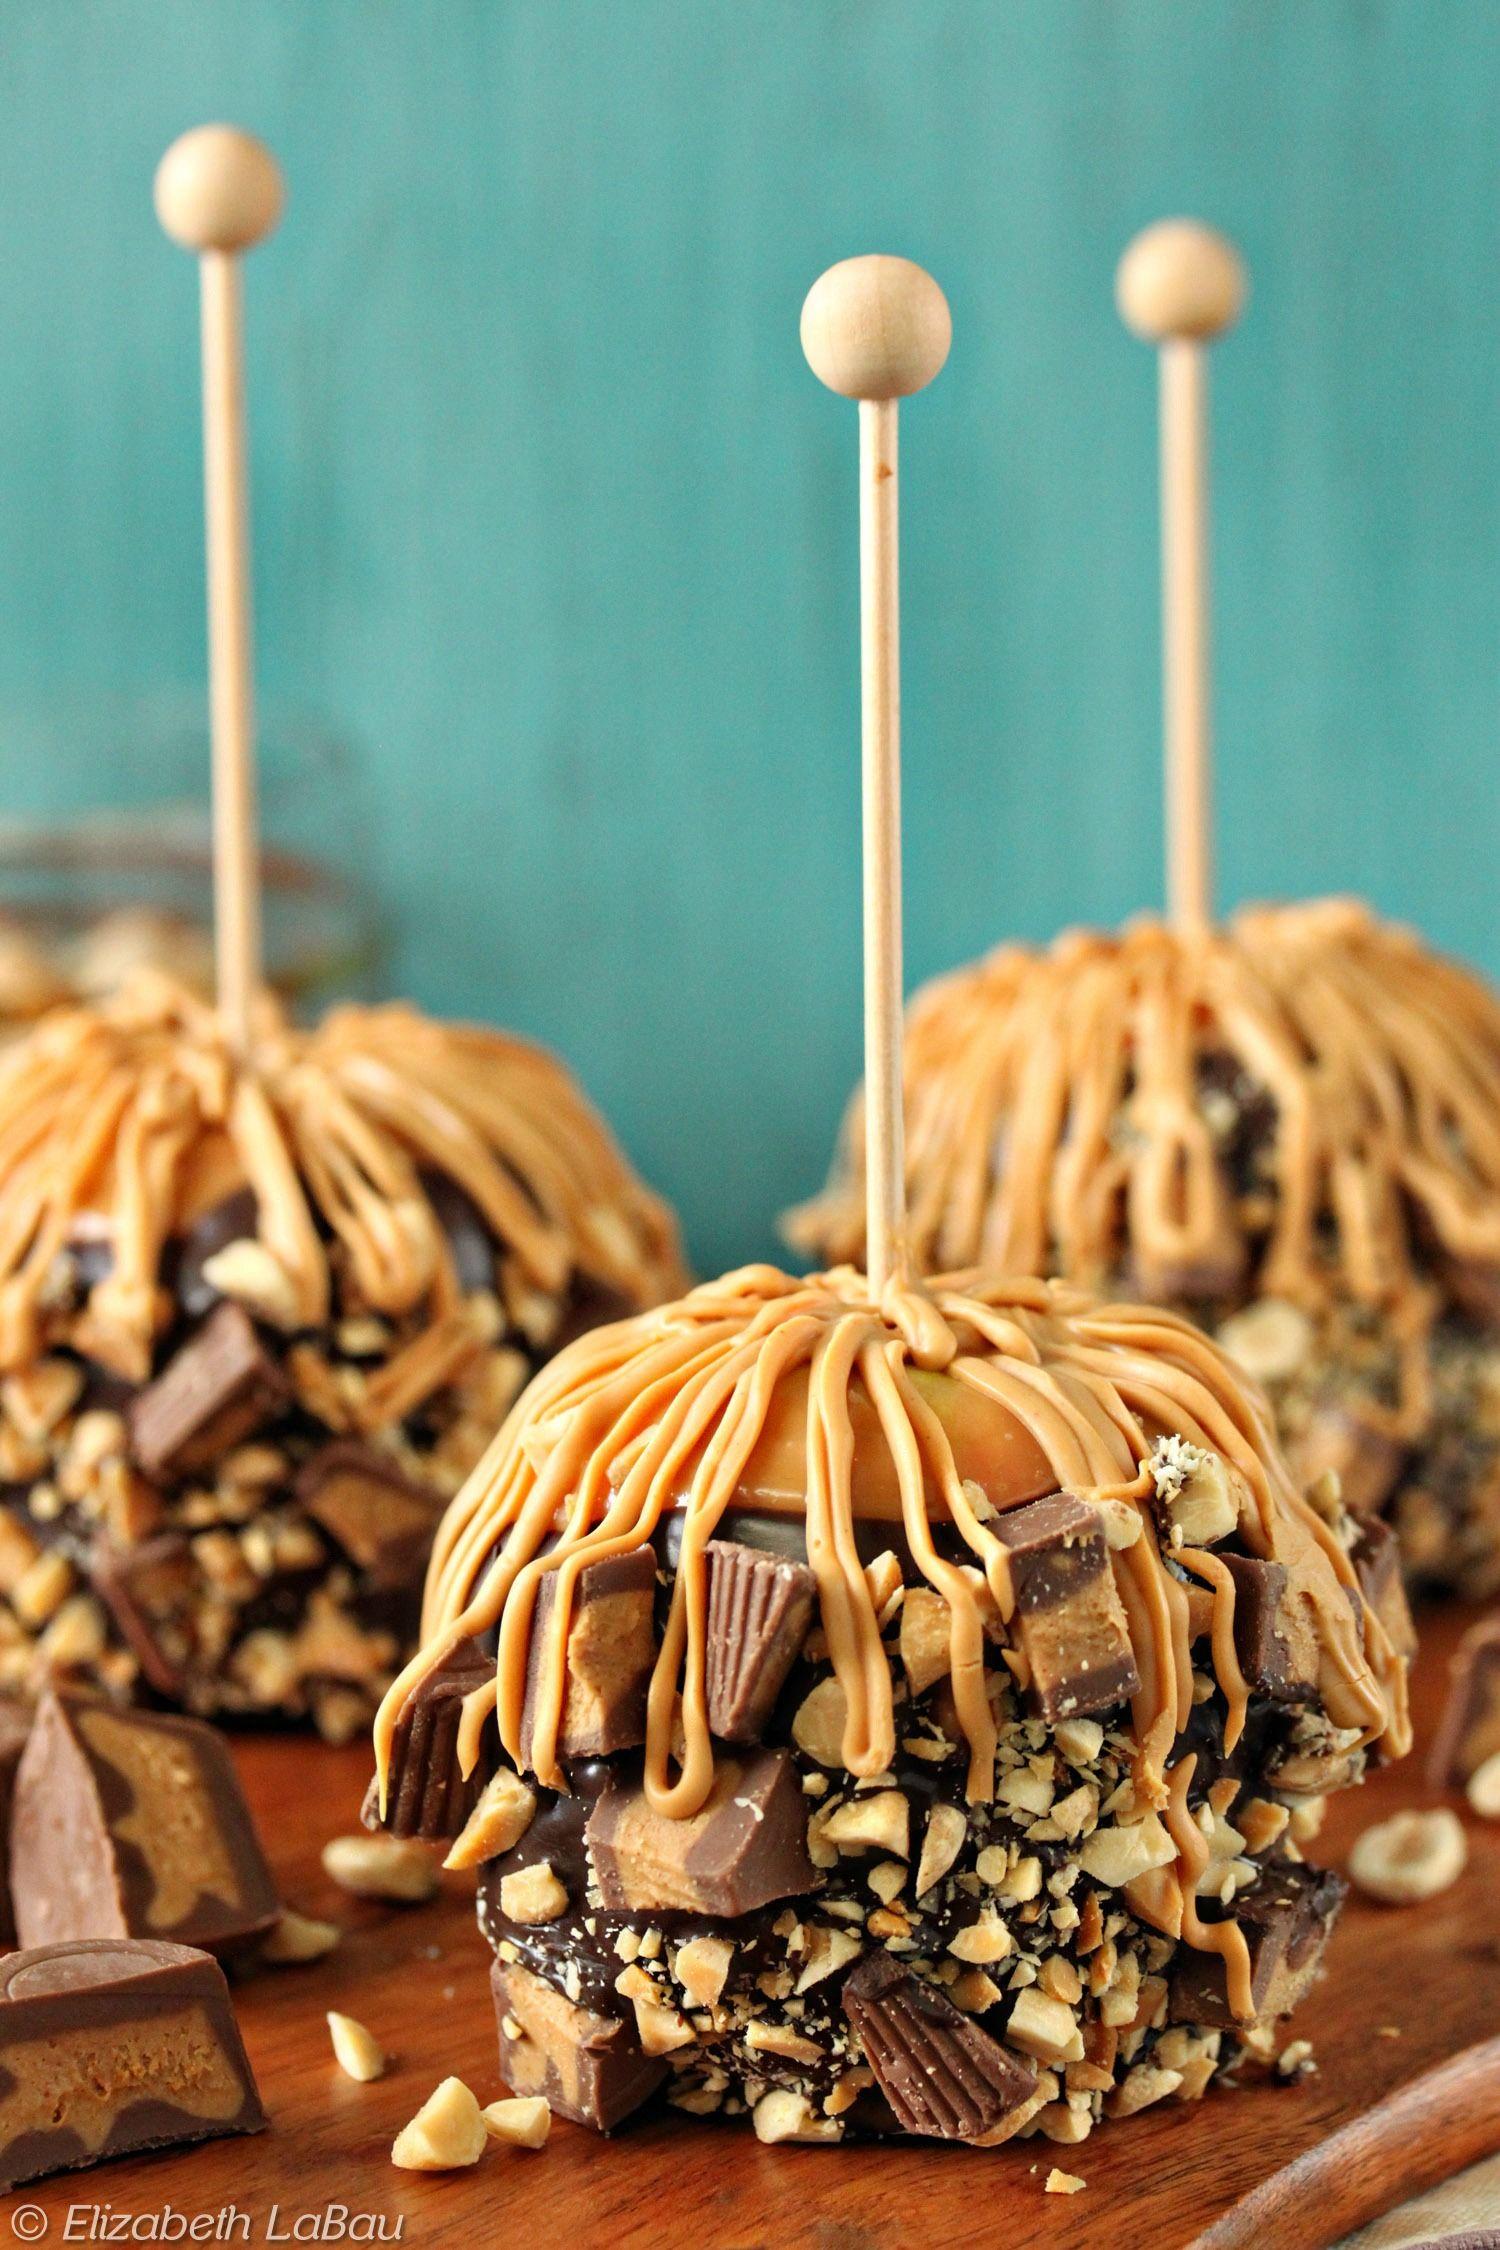 Peanut Butter Caramel Apples Recipe Peanut butter cups